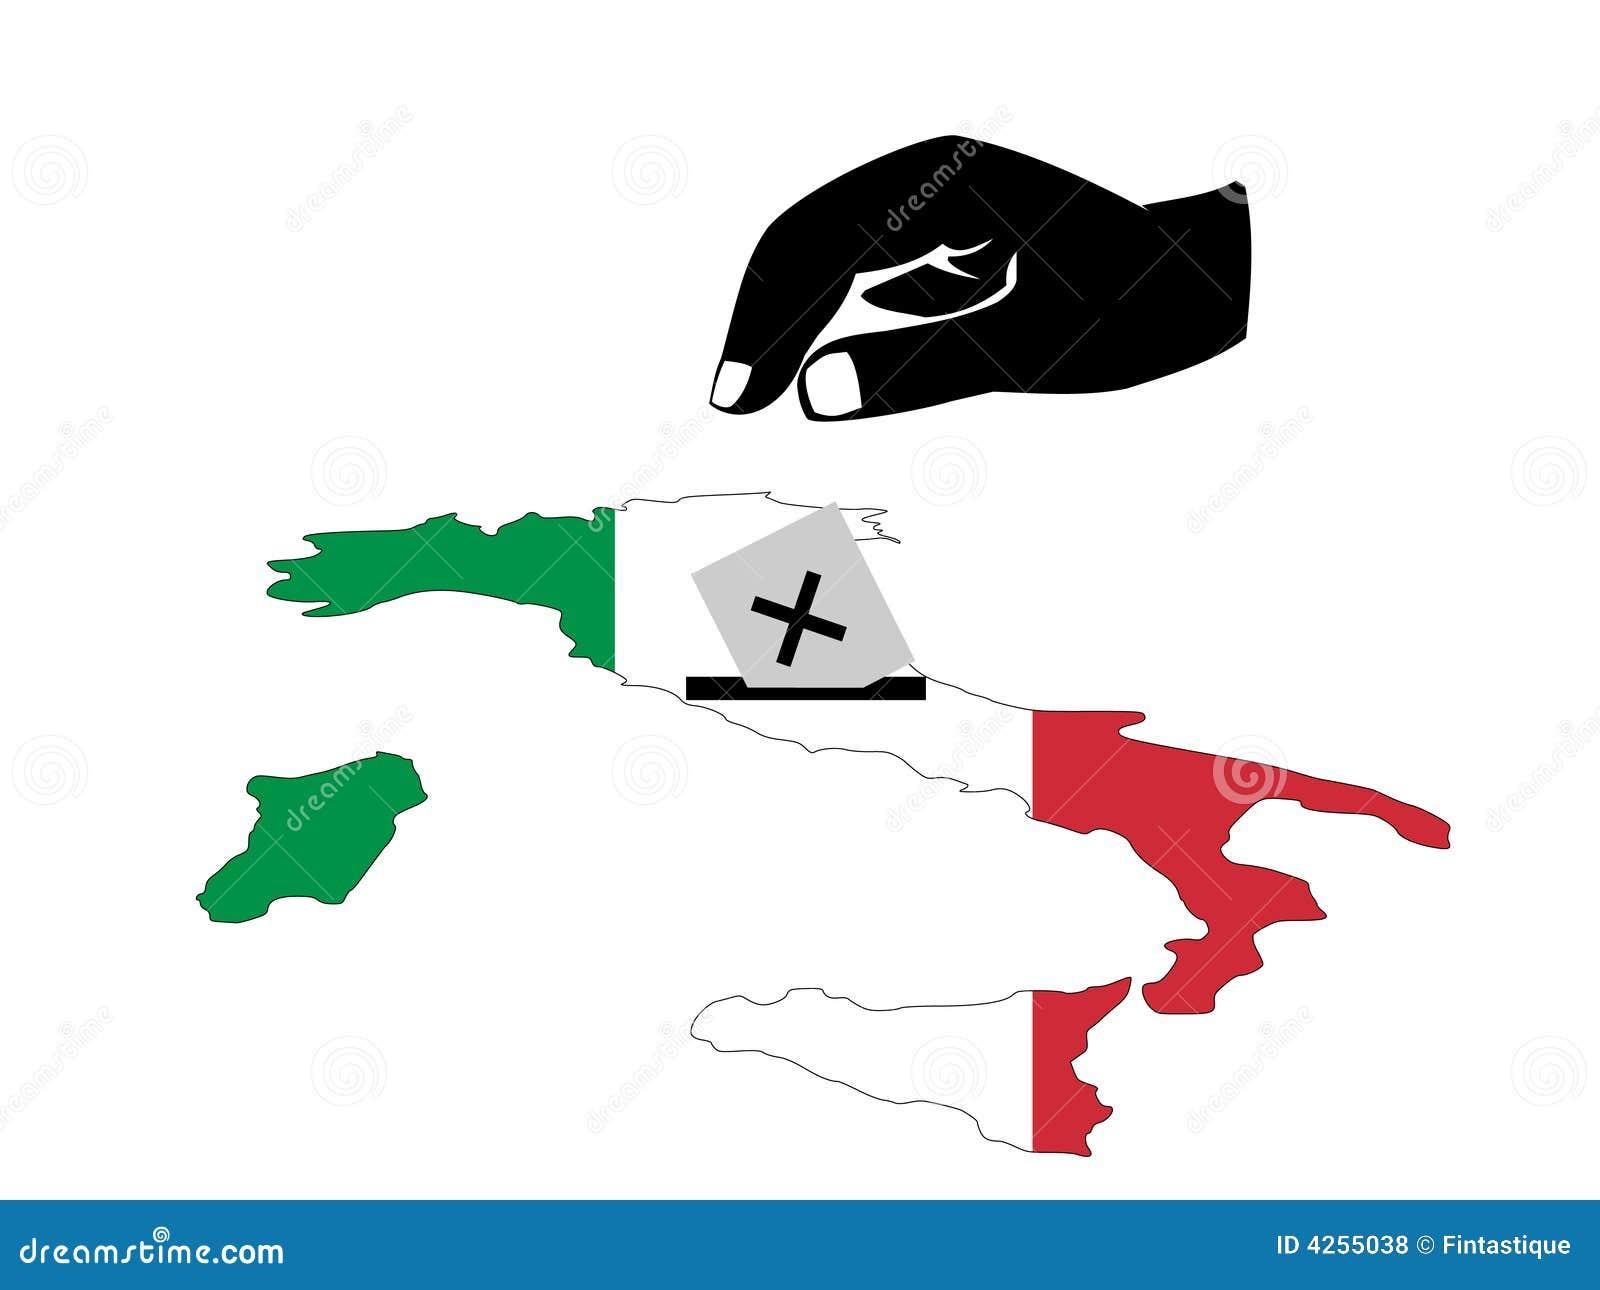 Voting in Italian election